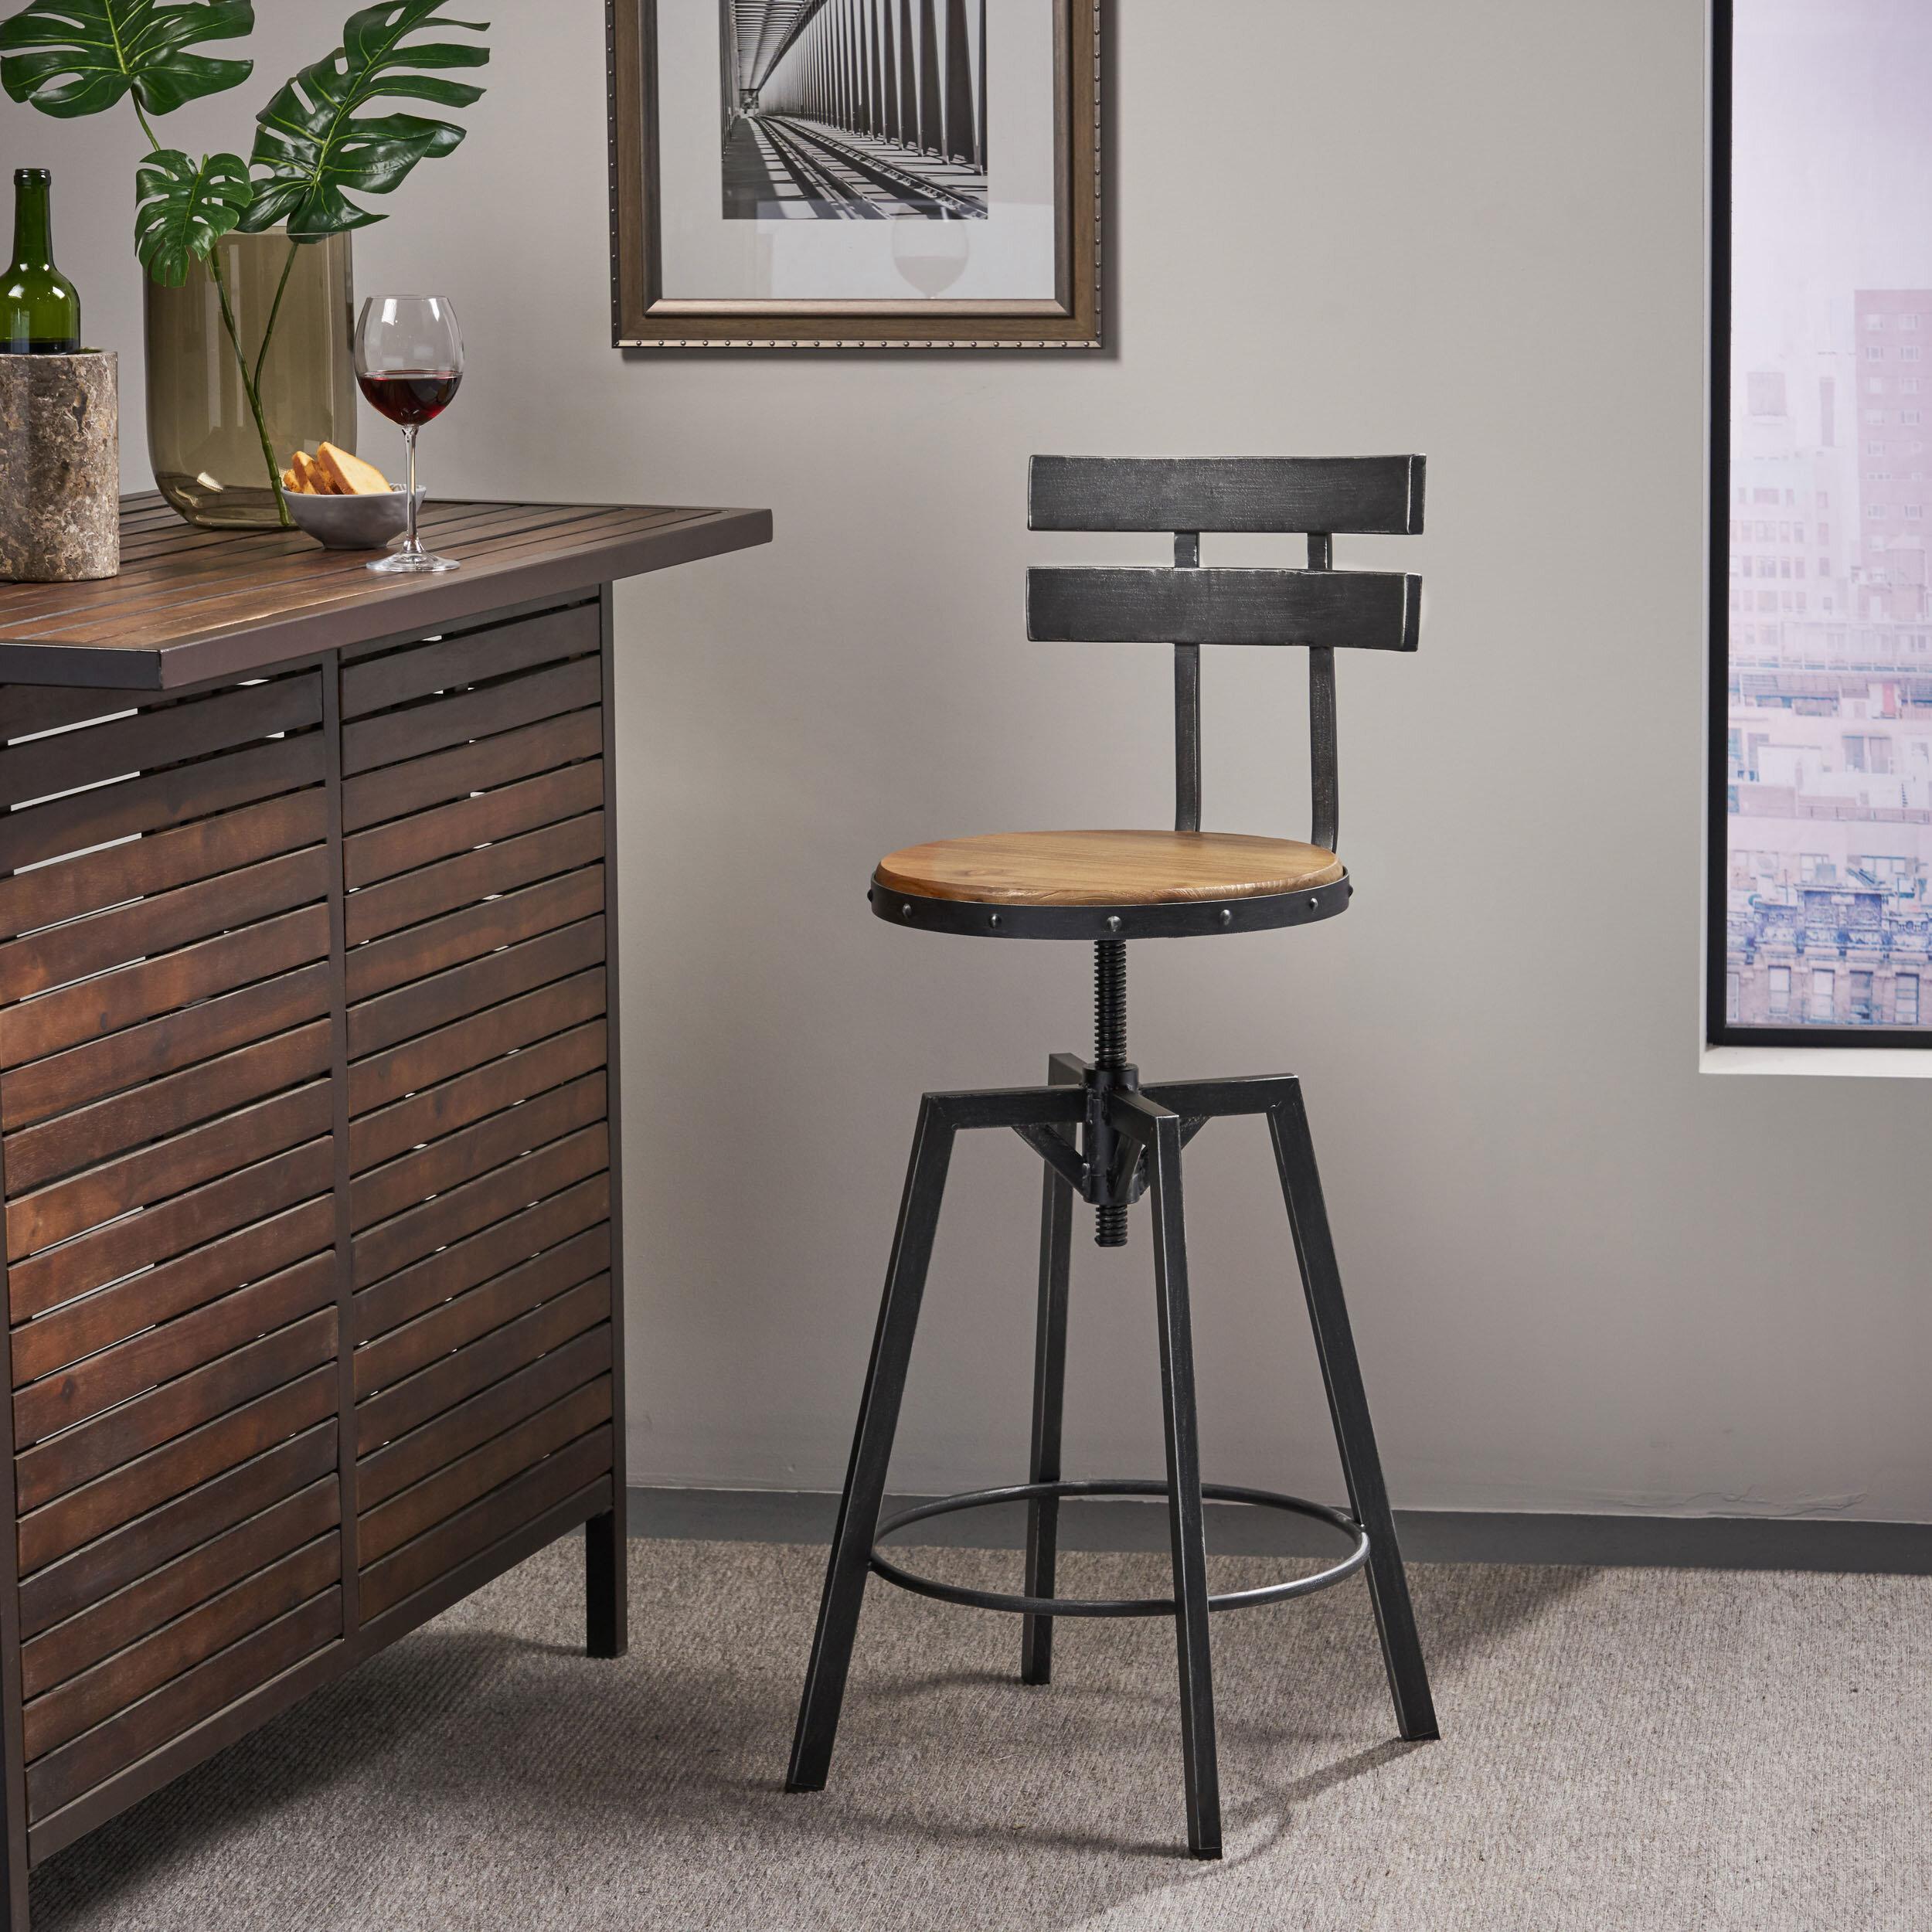 Prime Sylvania Adjustable Height Swivel Bar Stool Gamerscity Chair Design For Home Gamerscityorg